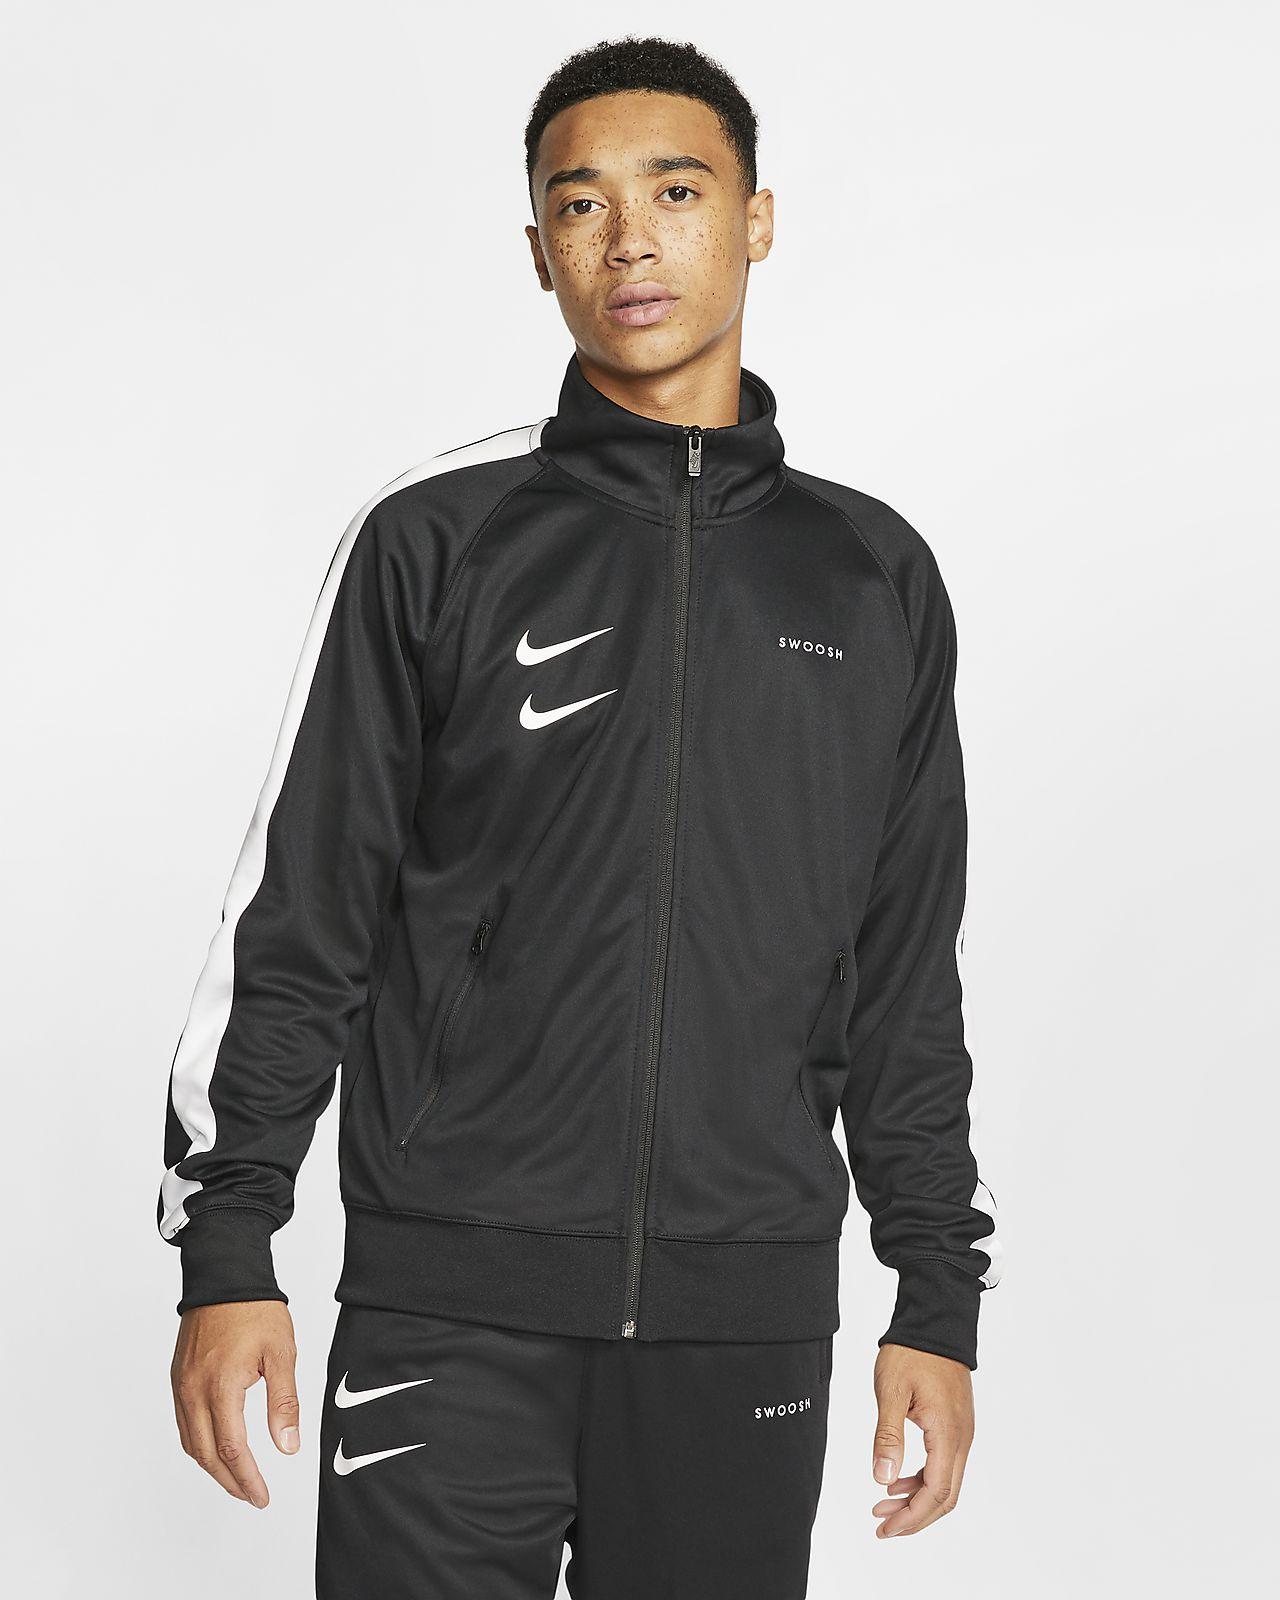 Jacka Nike Sportswear Swoosh för män